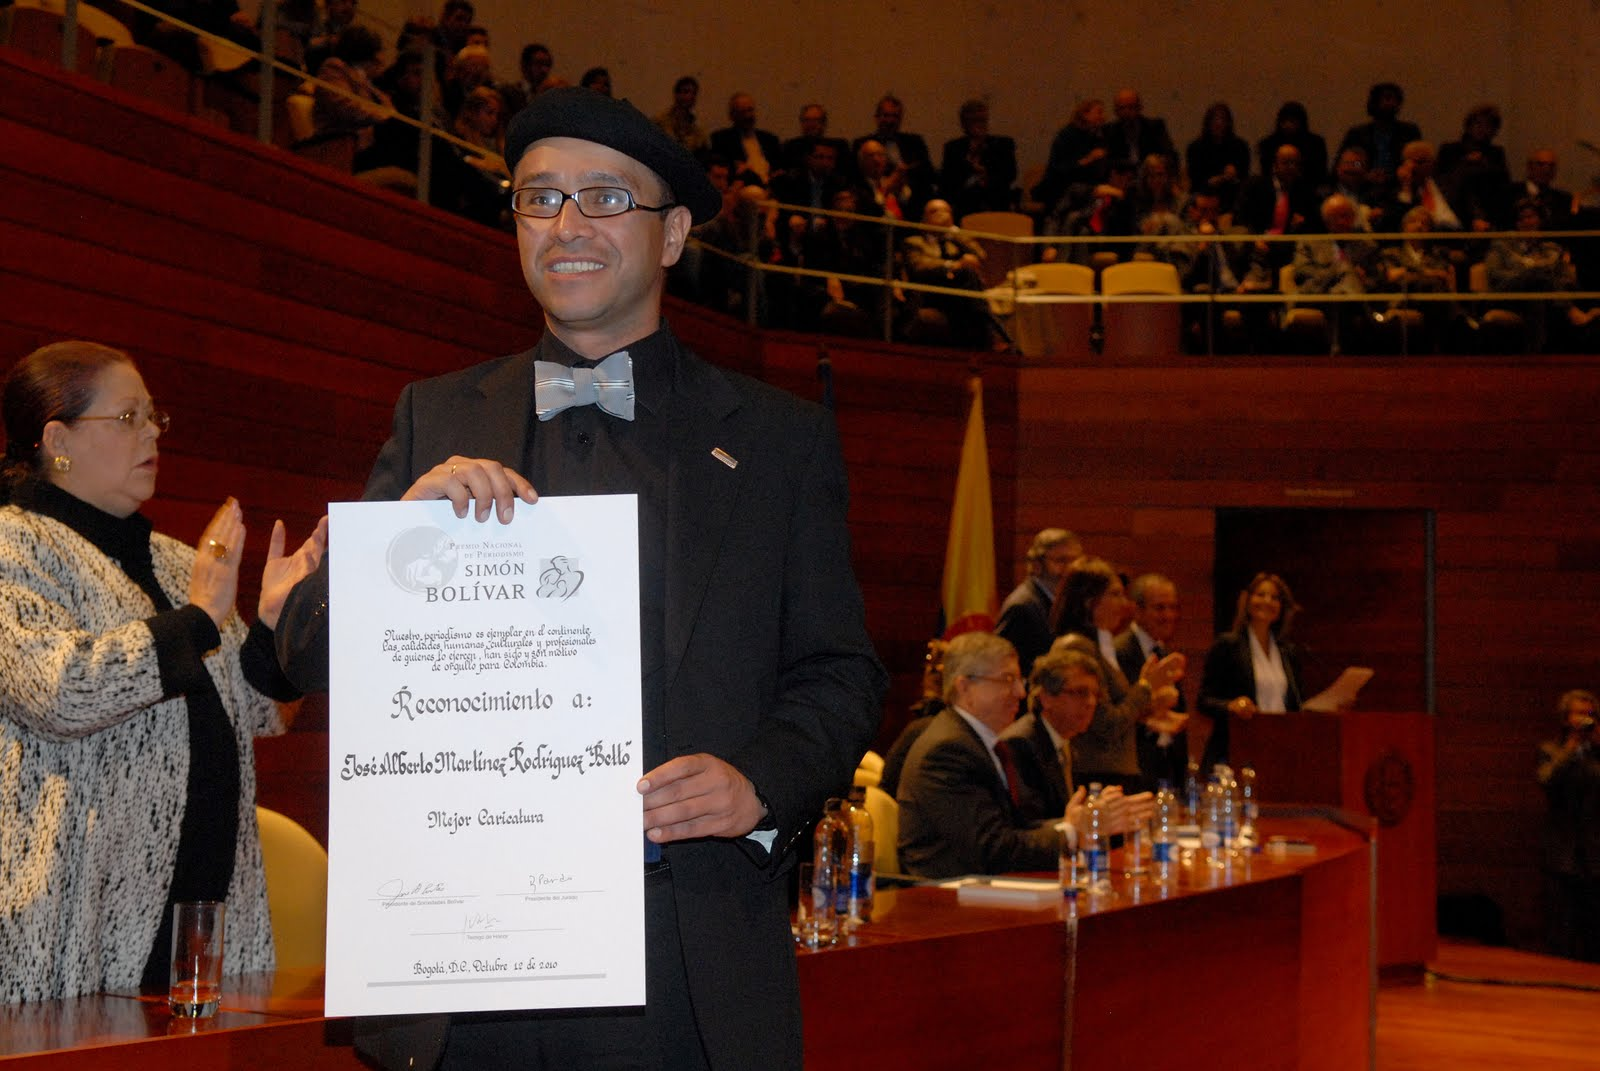 PREMIO SIMÓN BOLÍVAR 2010